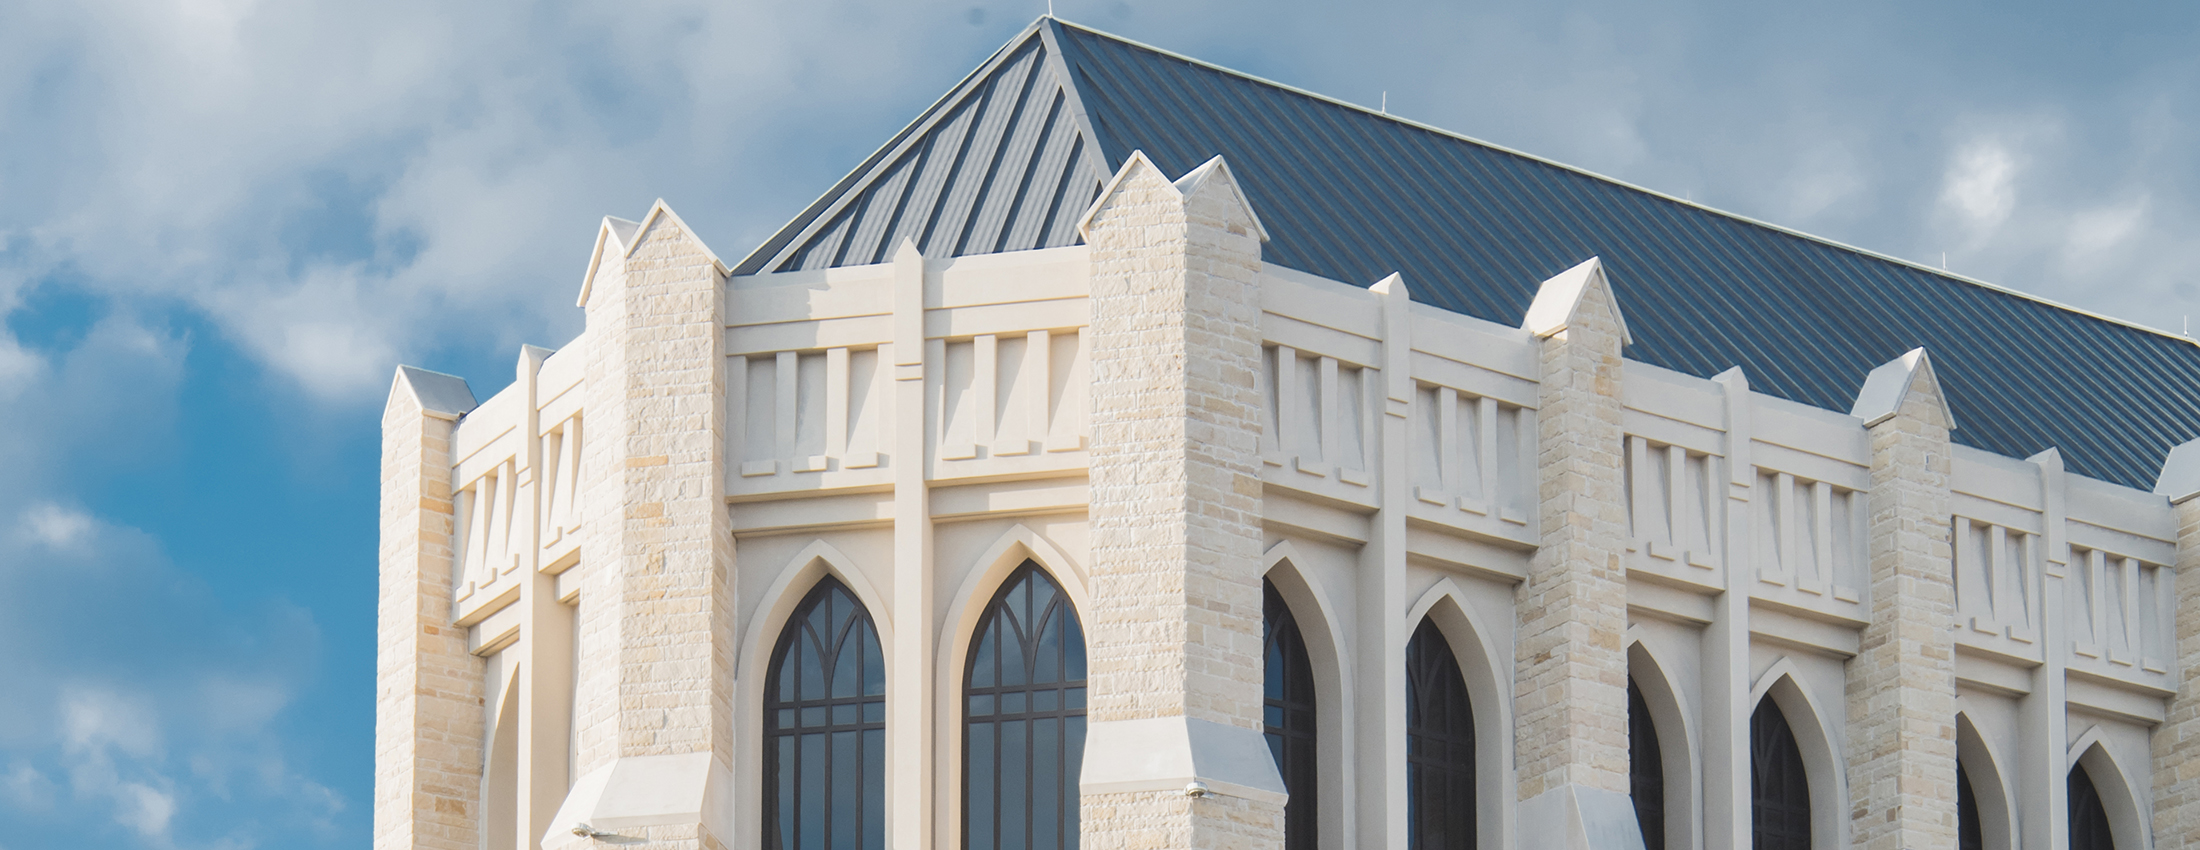 Elevate Life Church - McKinney